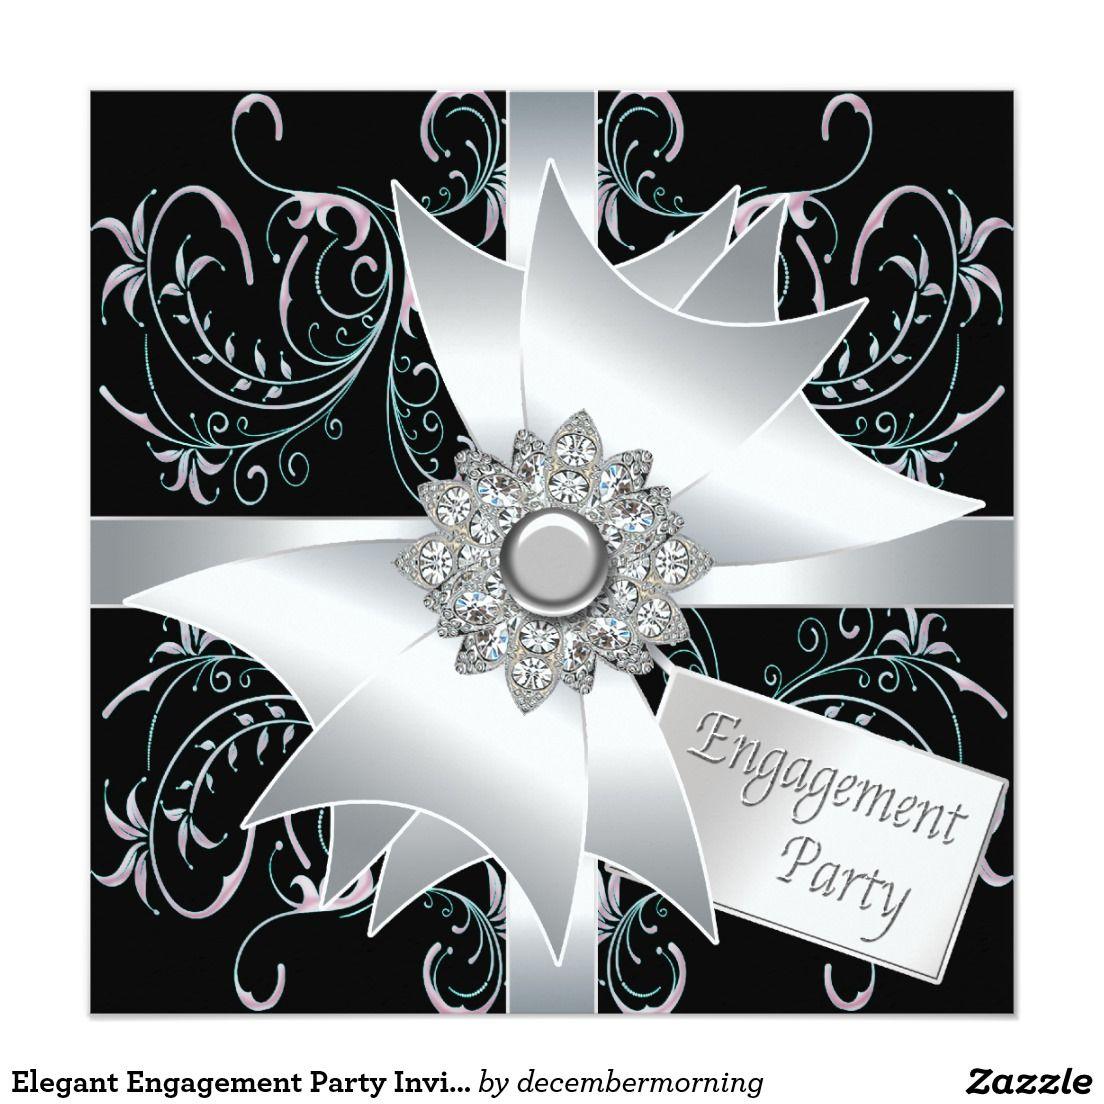 Elegant Engagement Party Invitations | Engagement party ...